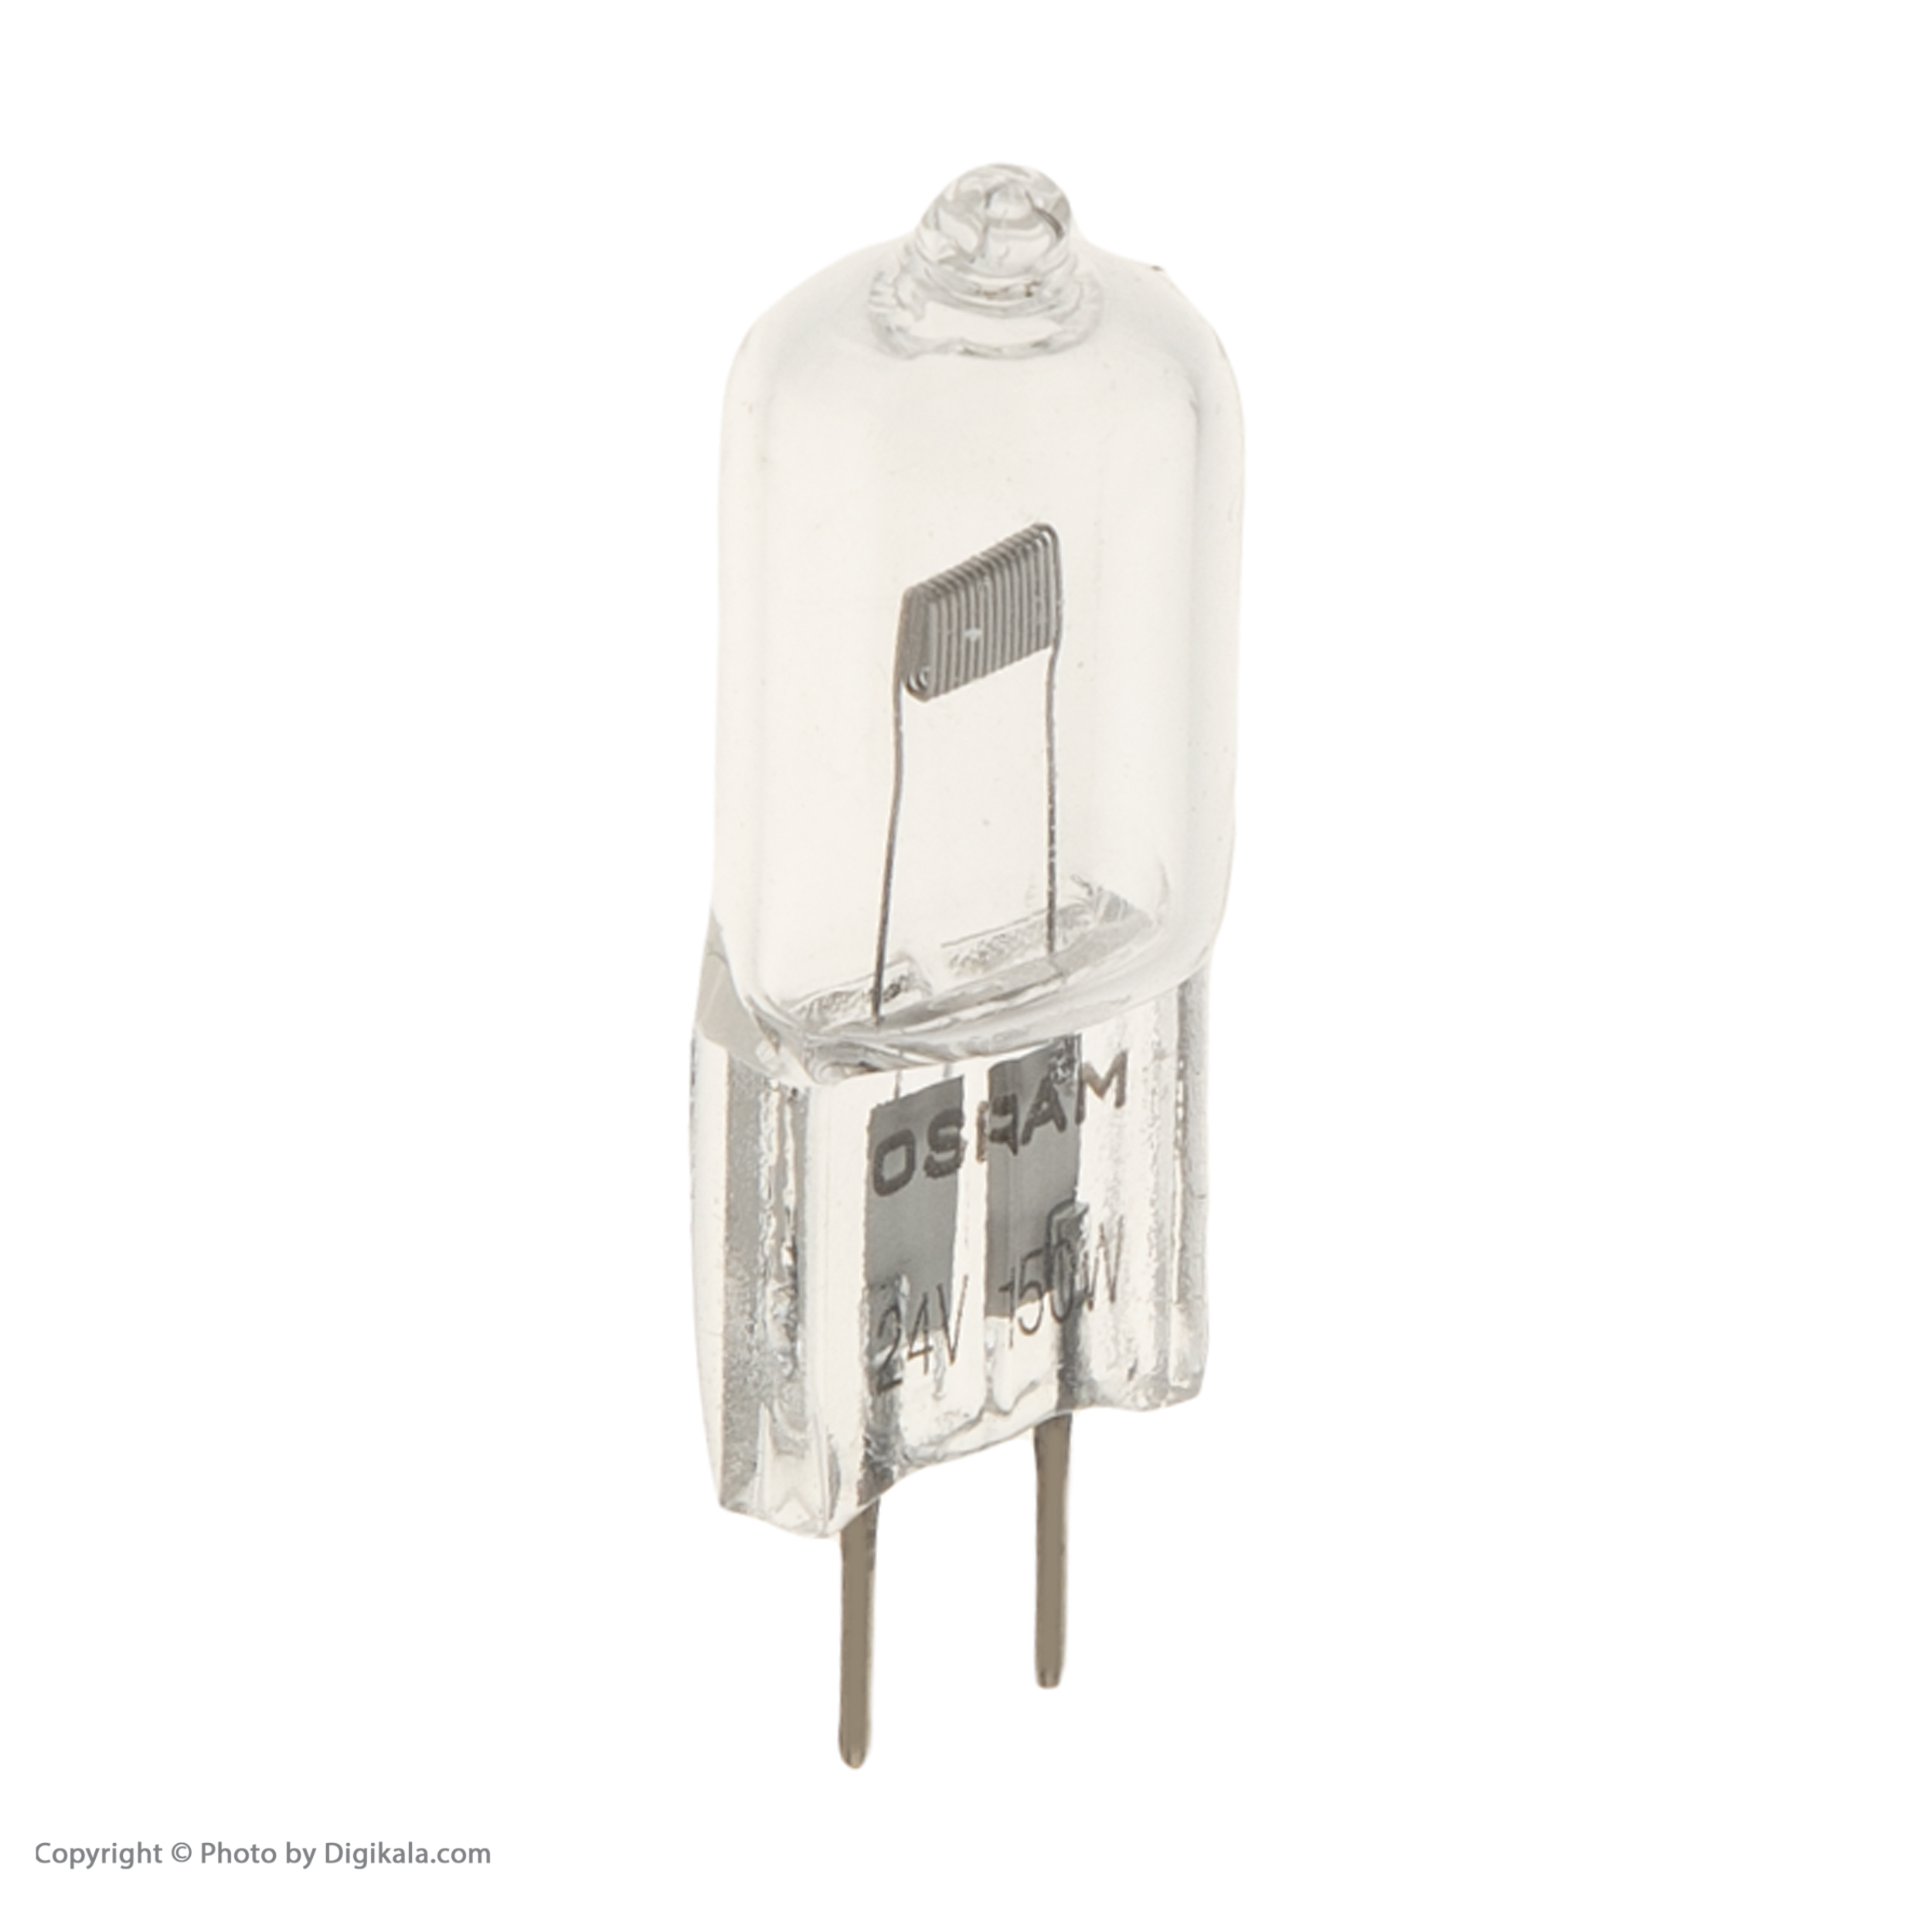 لامپ 150 وات مدل R09 پایه G6.35                     غیر اصل